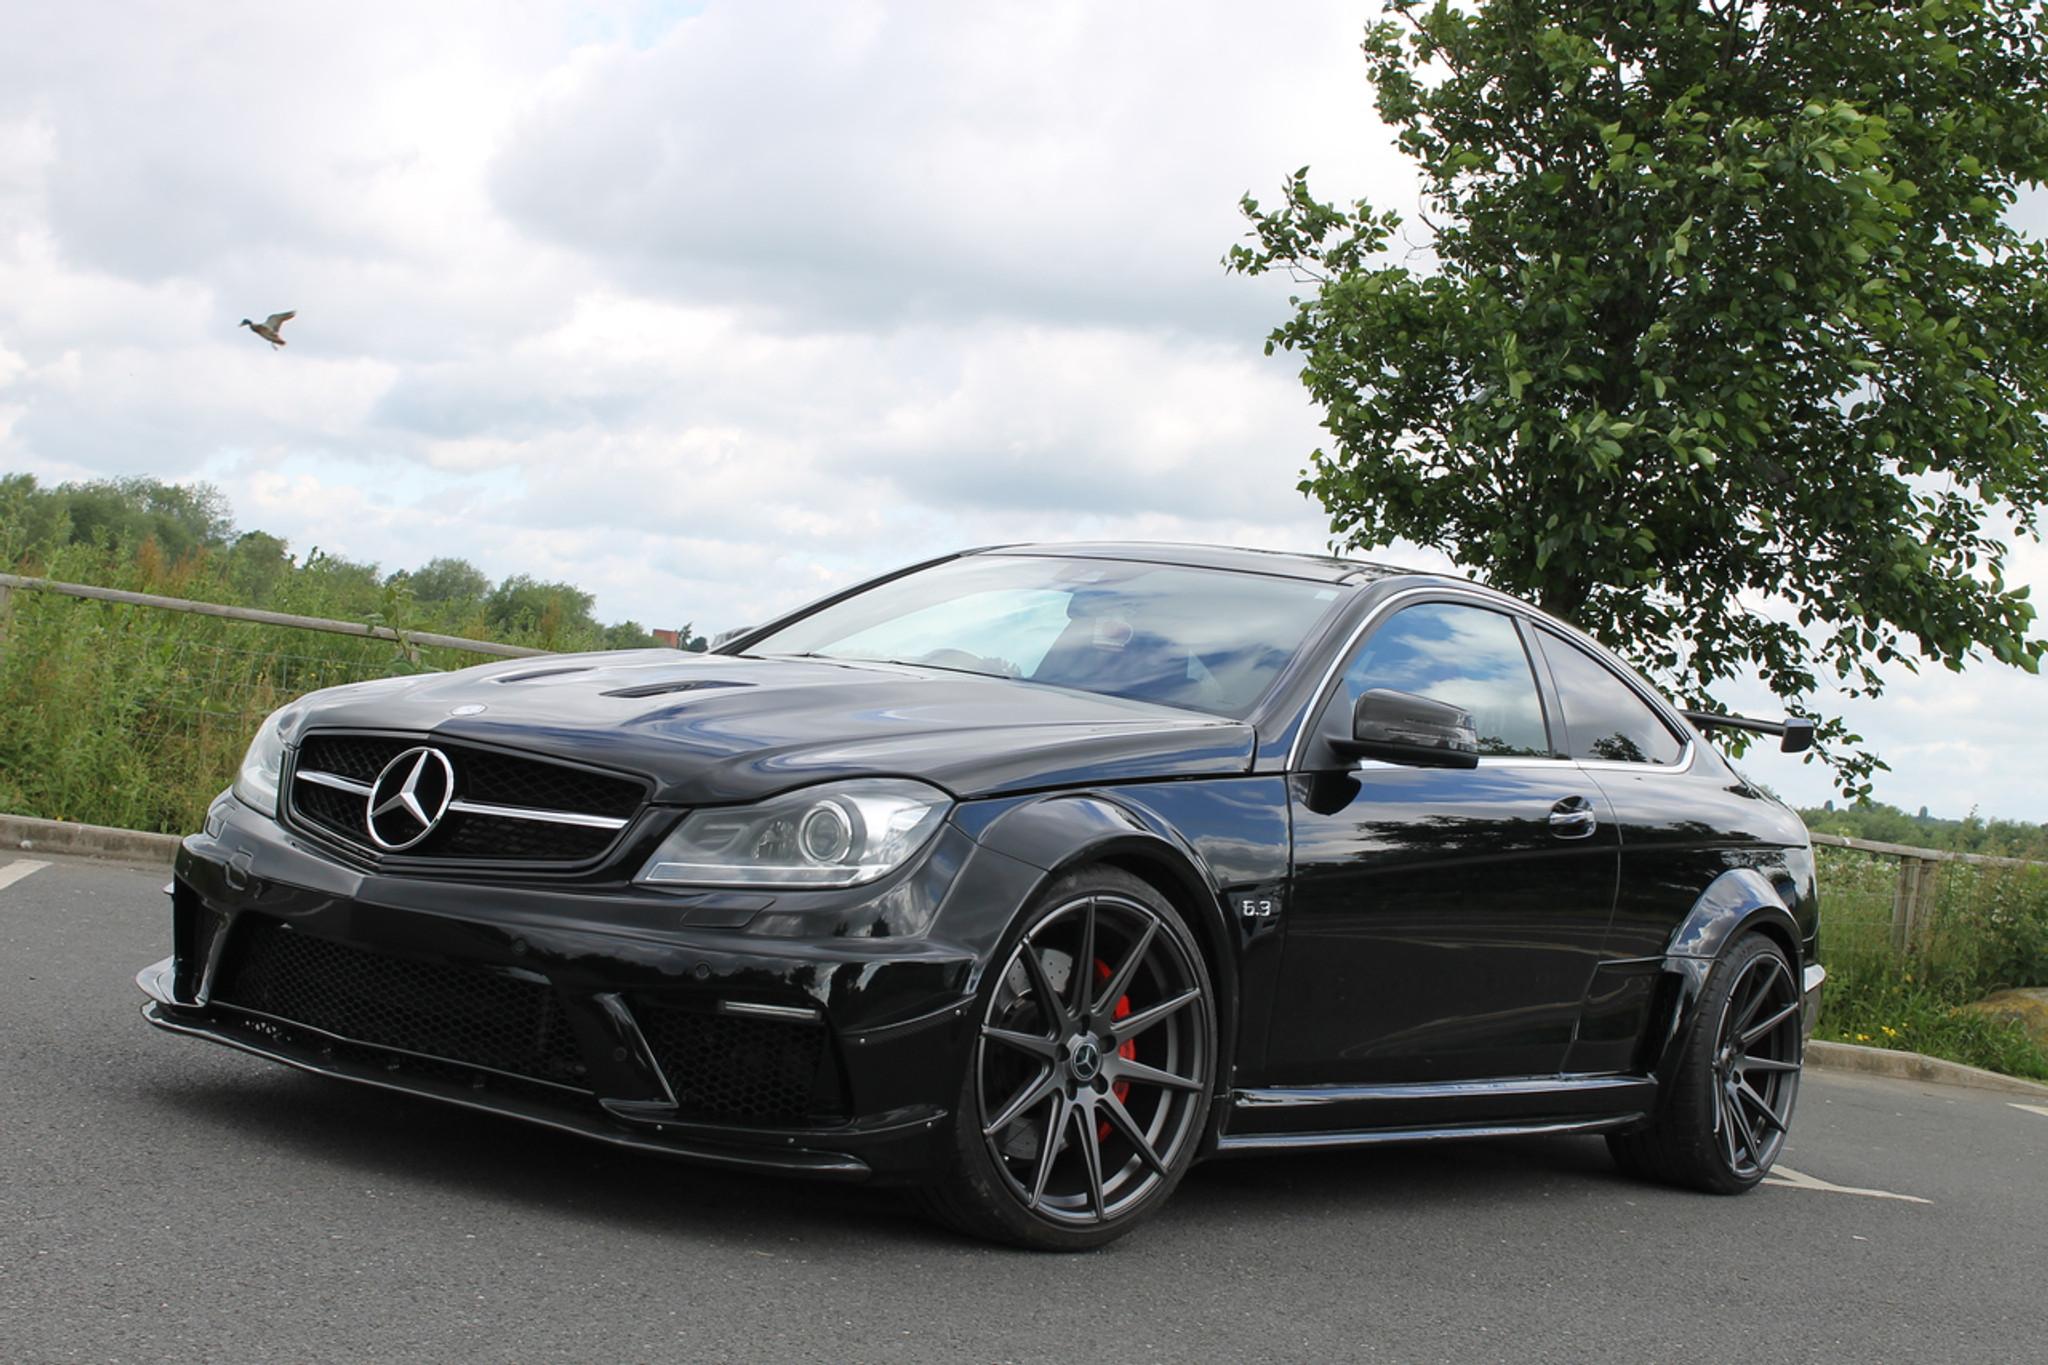 Mercedes Benz Coupe C63 Amg Black Series Conversion Meduza Design Ltd